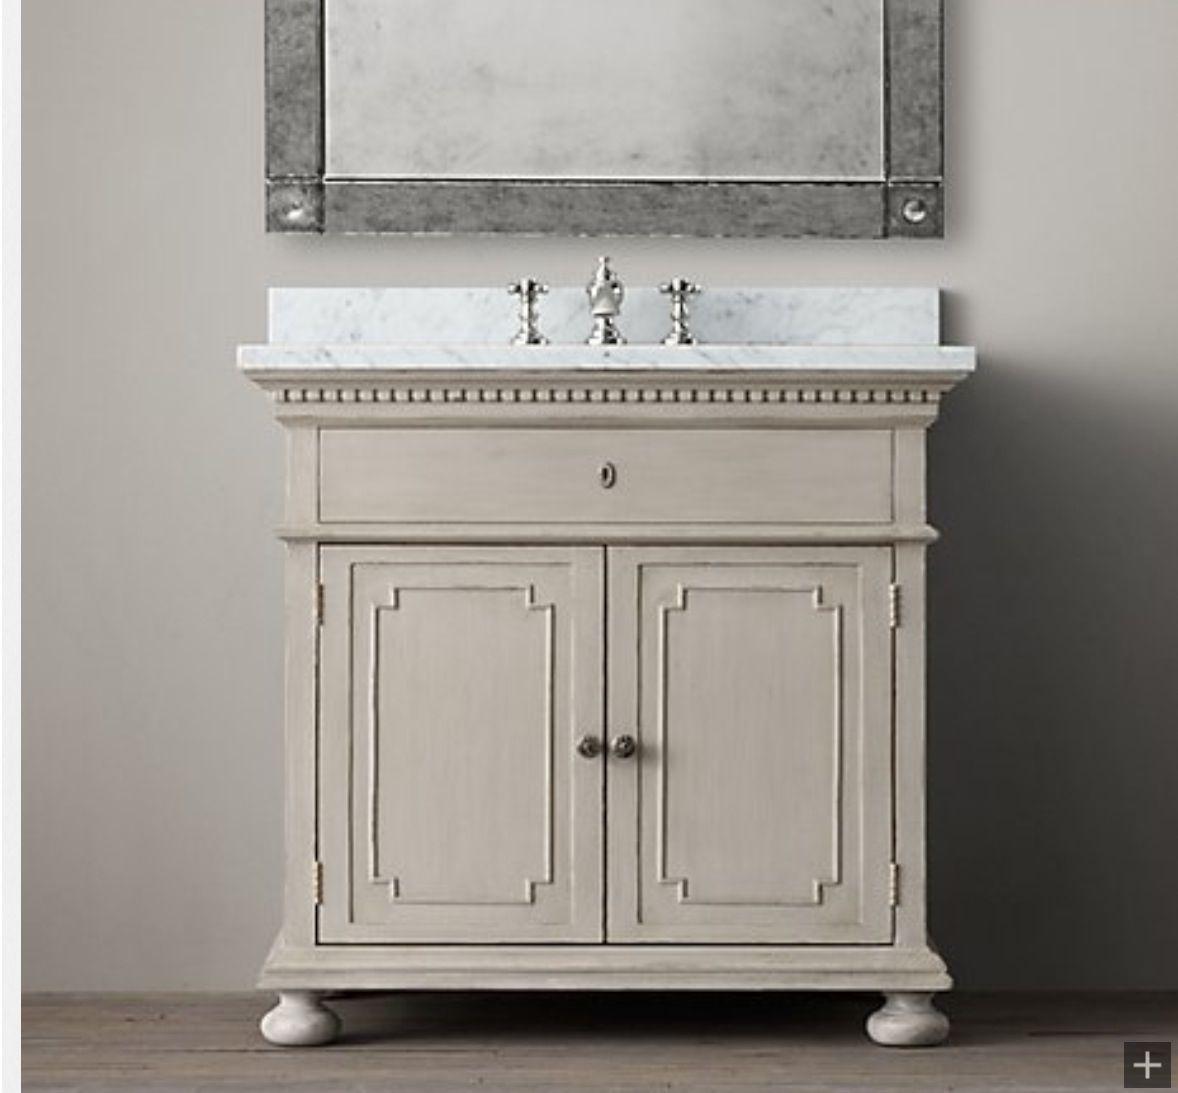 Bathroom cabinet hardware dickies eisenhower extreme trousers